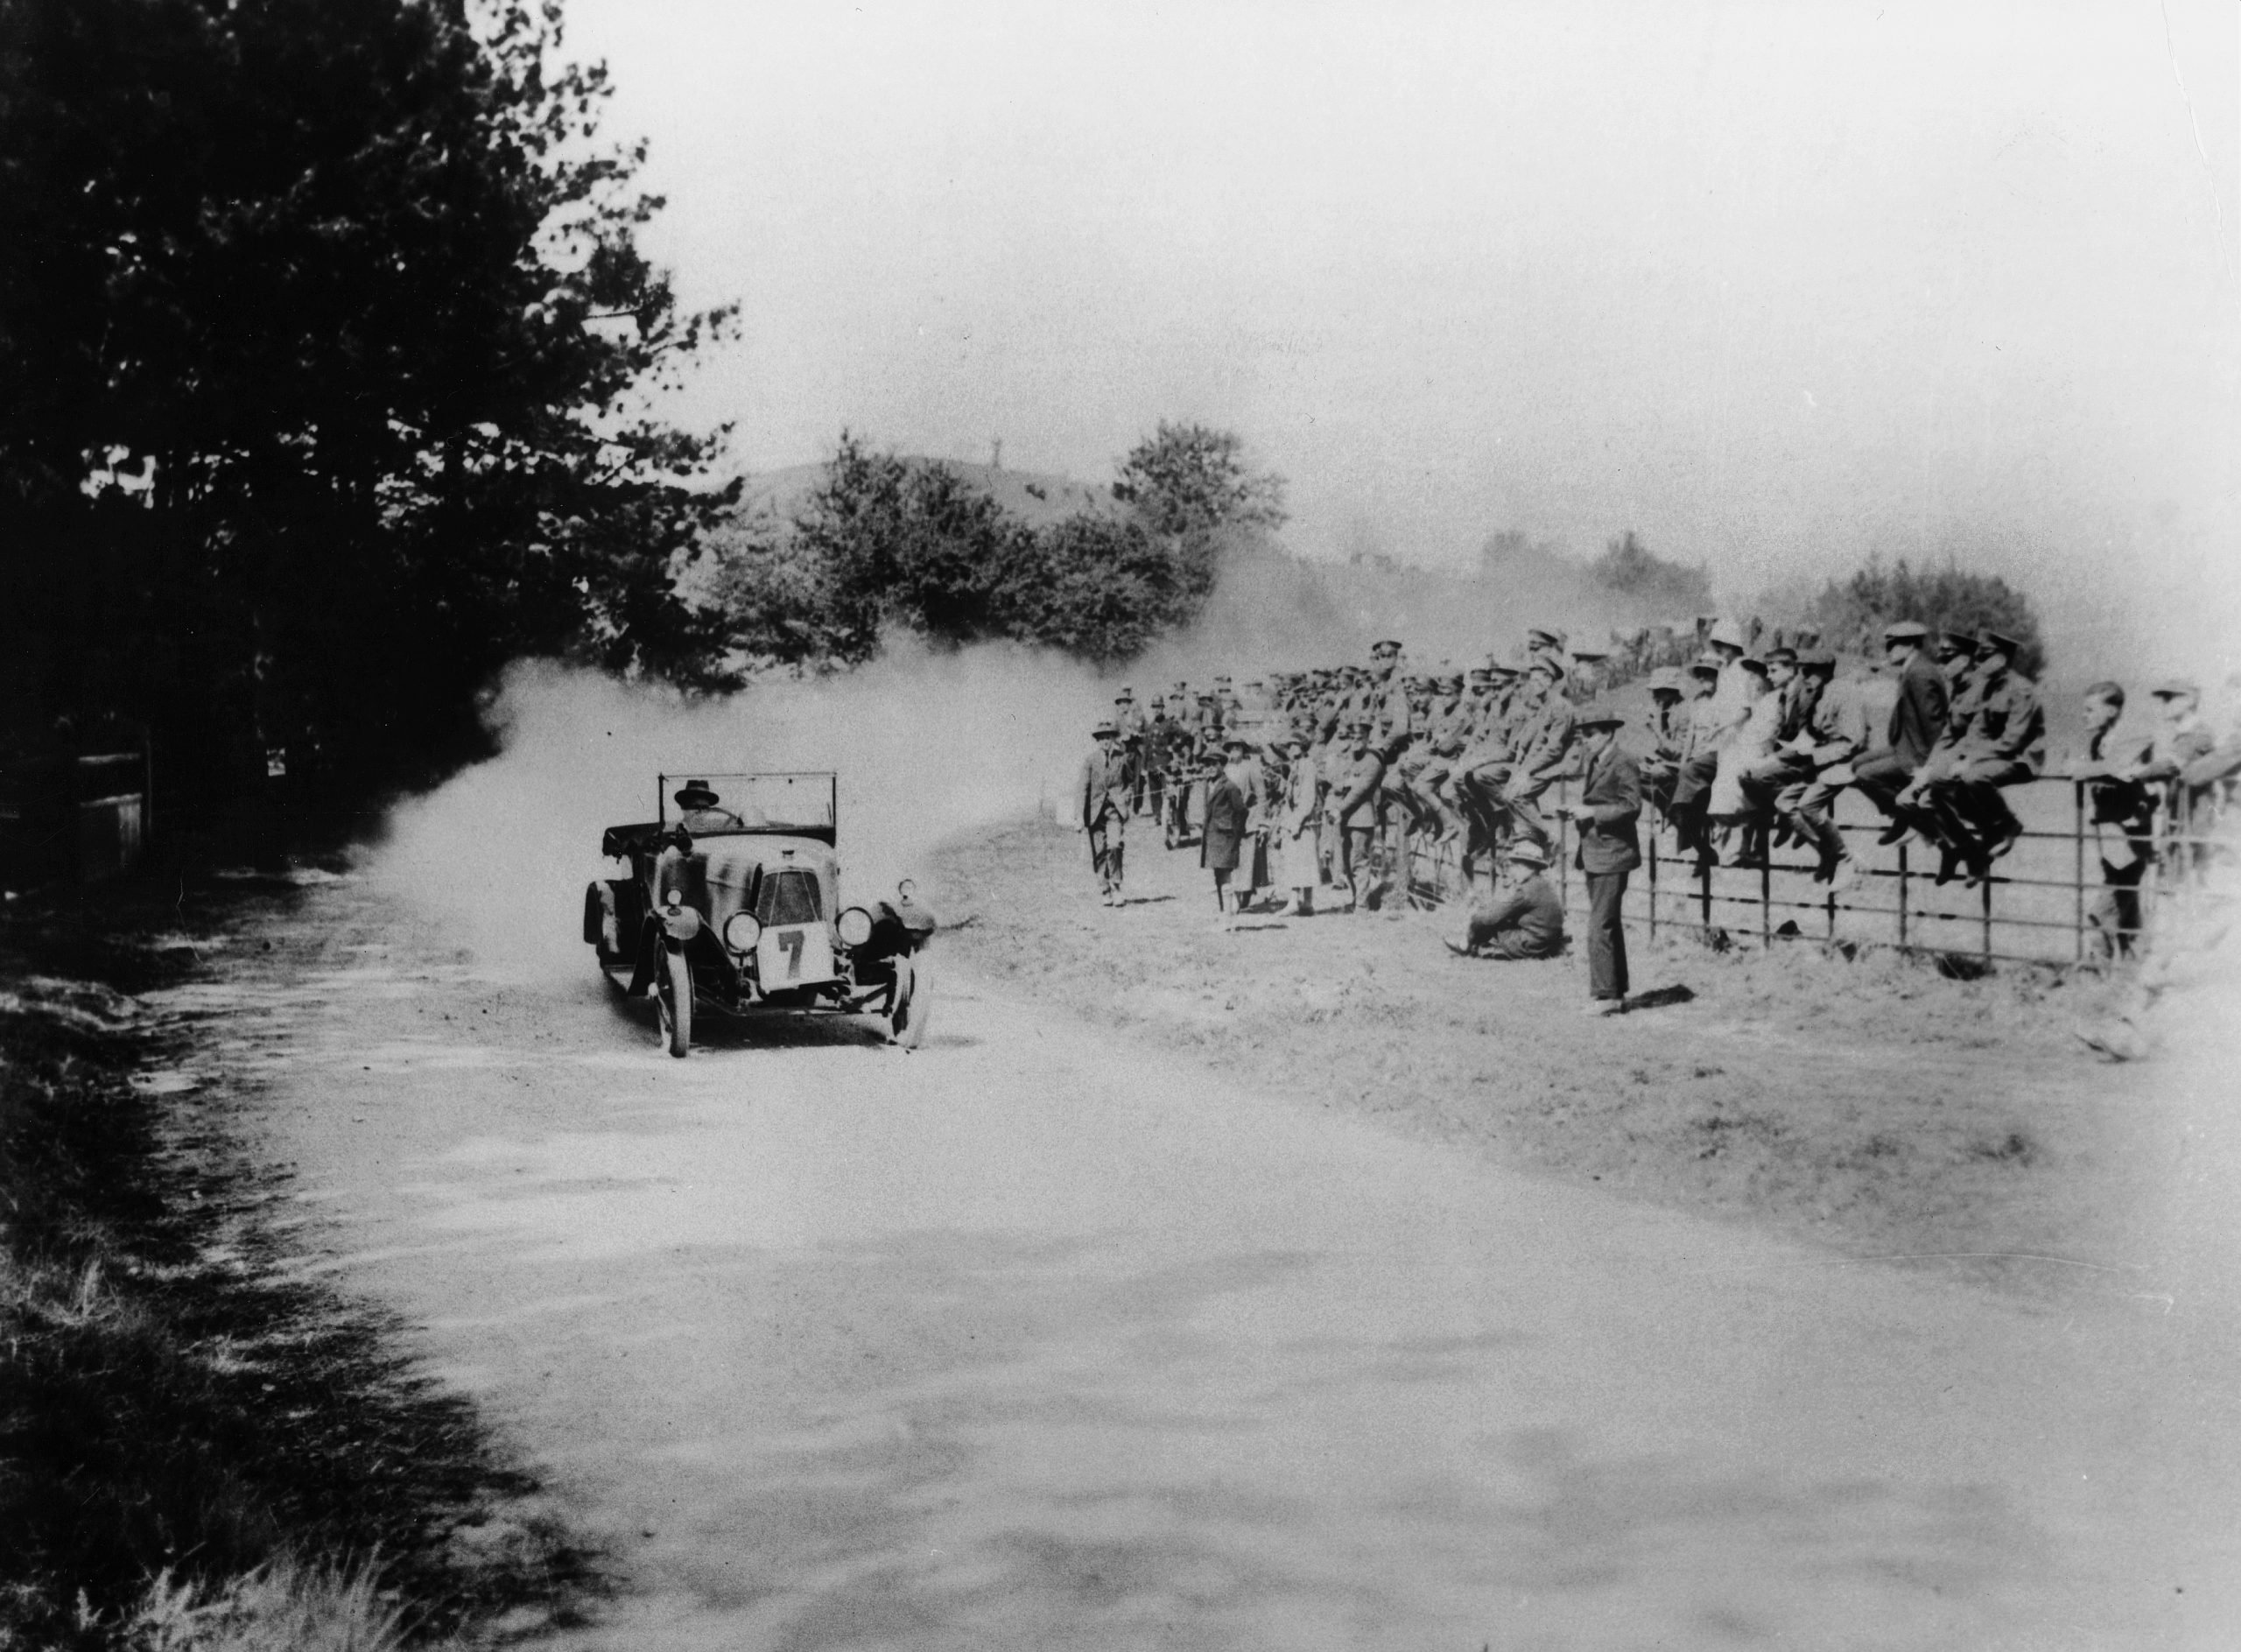 1921 Aston Martin SV at Aston Clinton Hill Climb